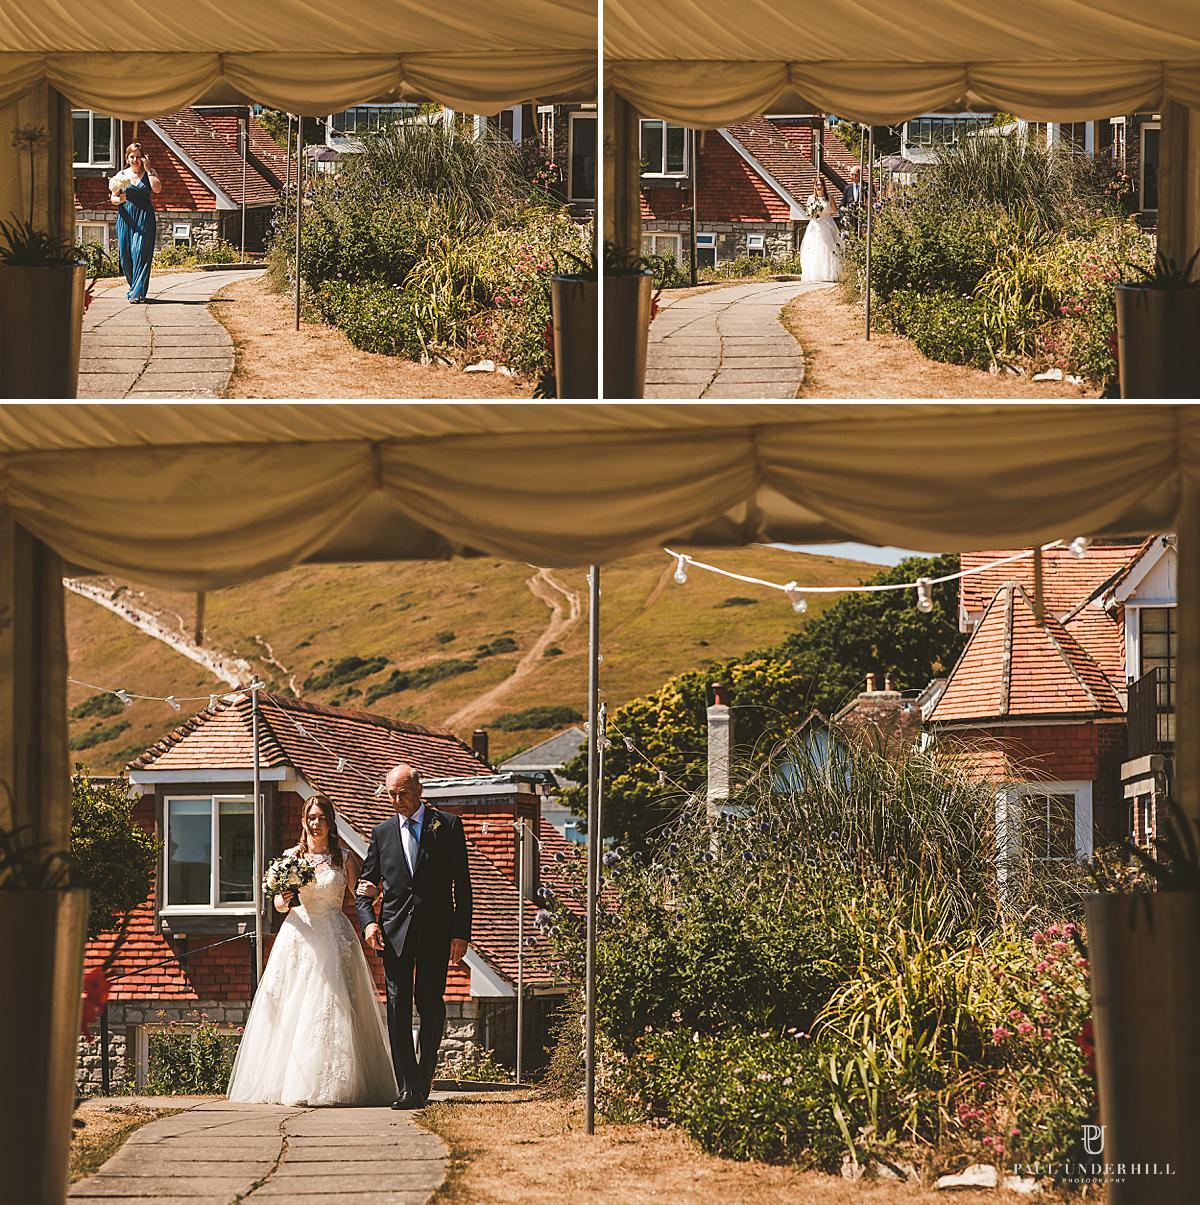 Lulworth Cove wedding photography Dorset